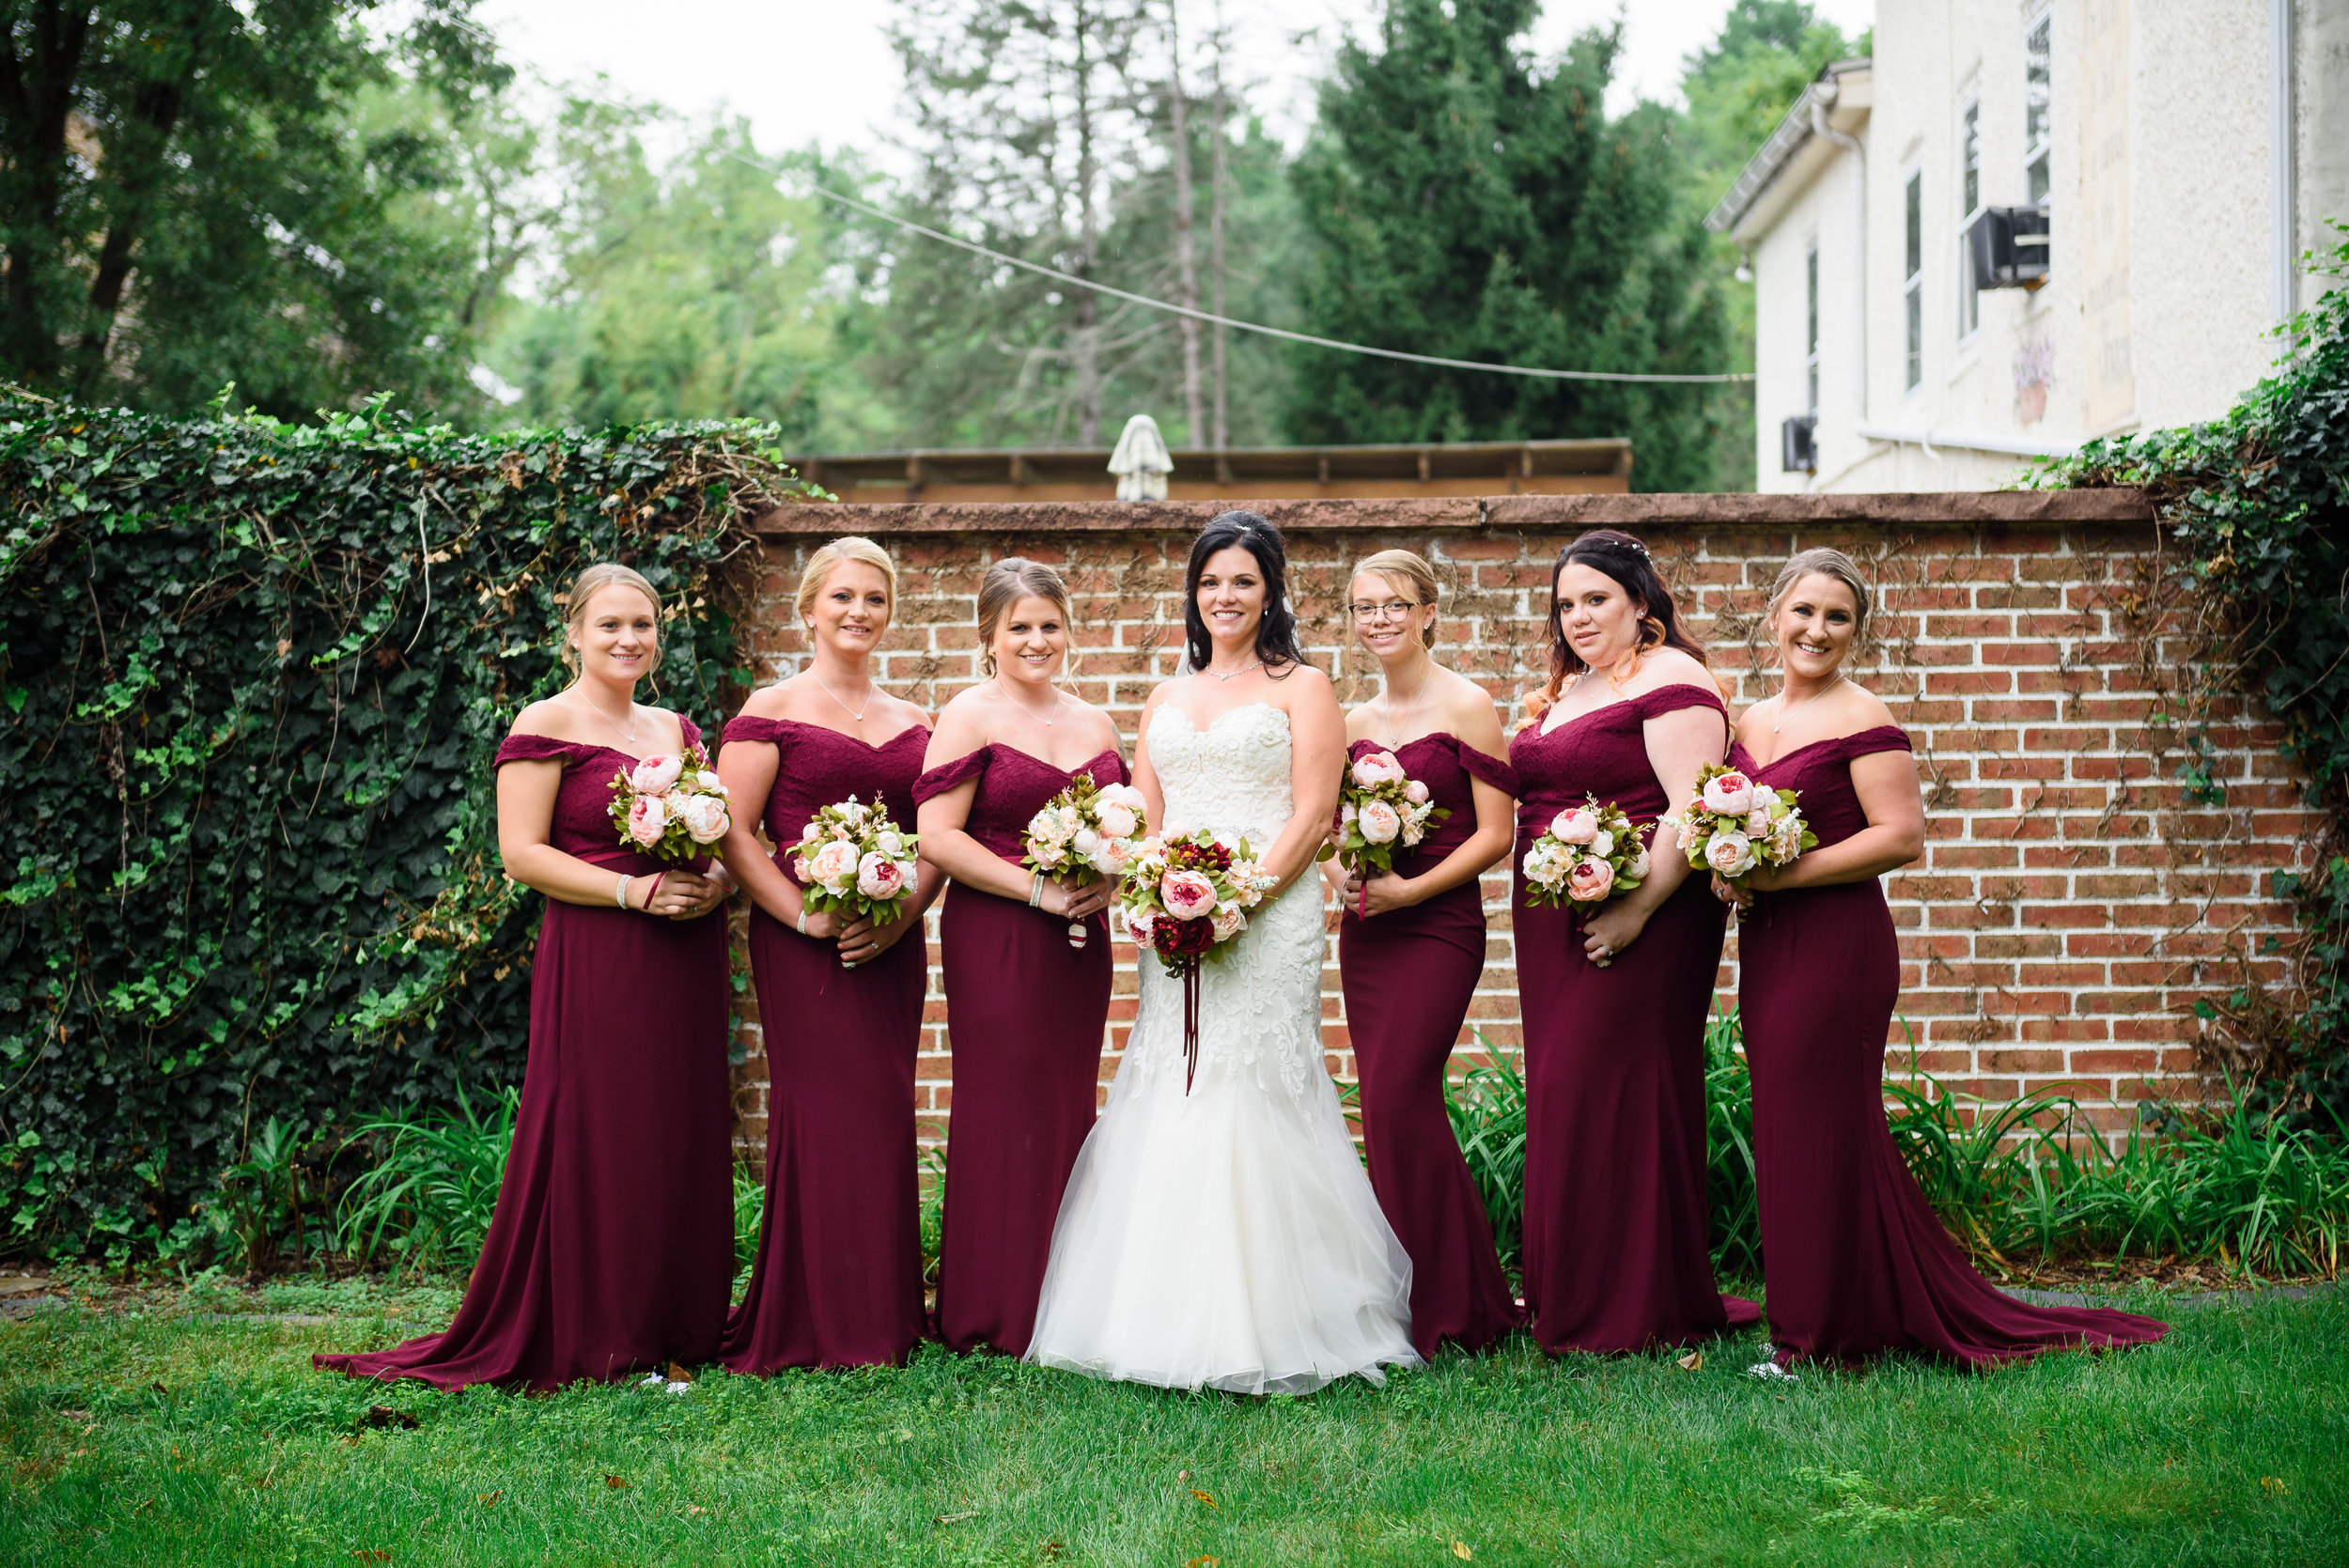 Heather-Jared-Wedding-Garcia-Photography-7878.jpg